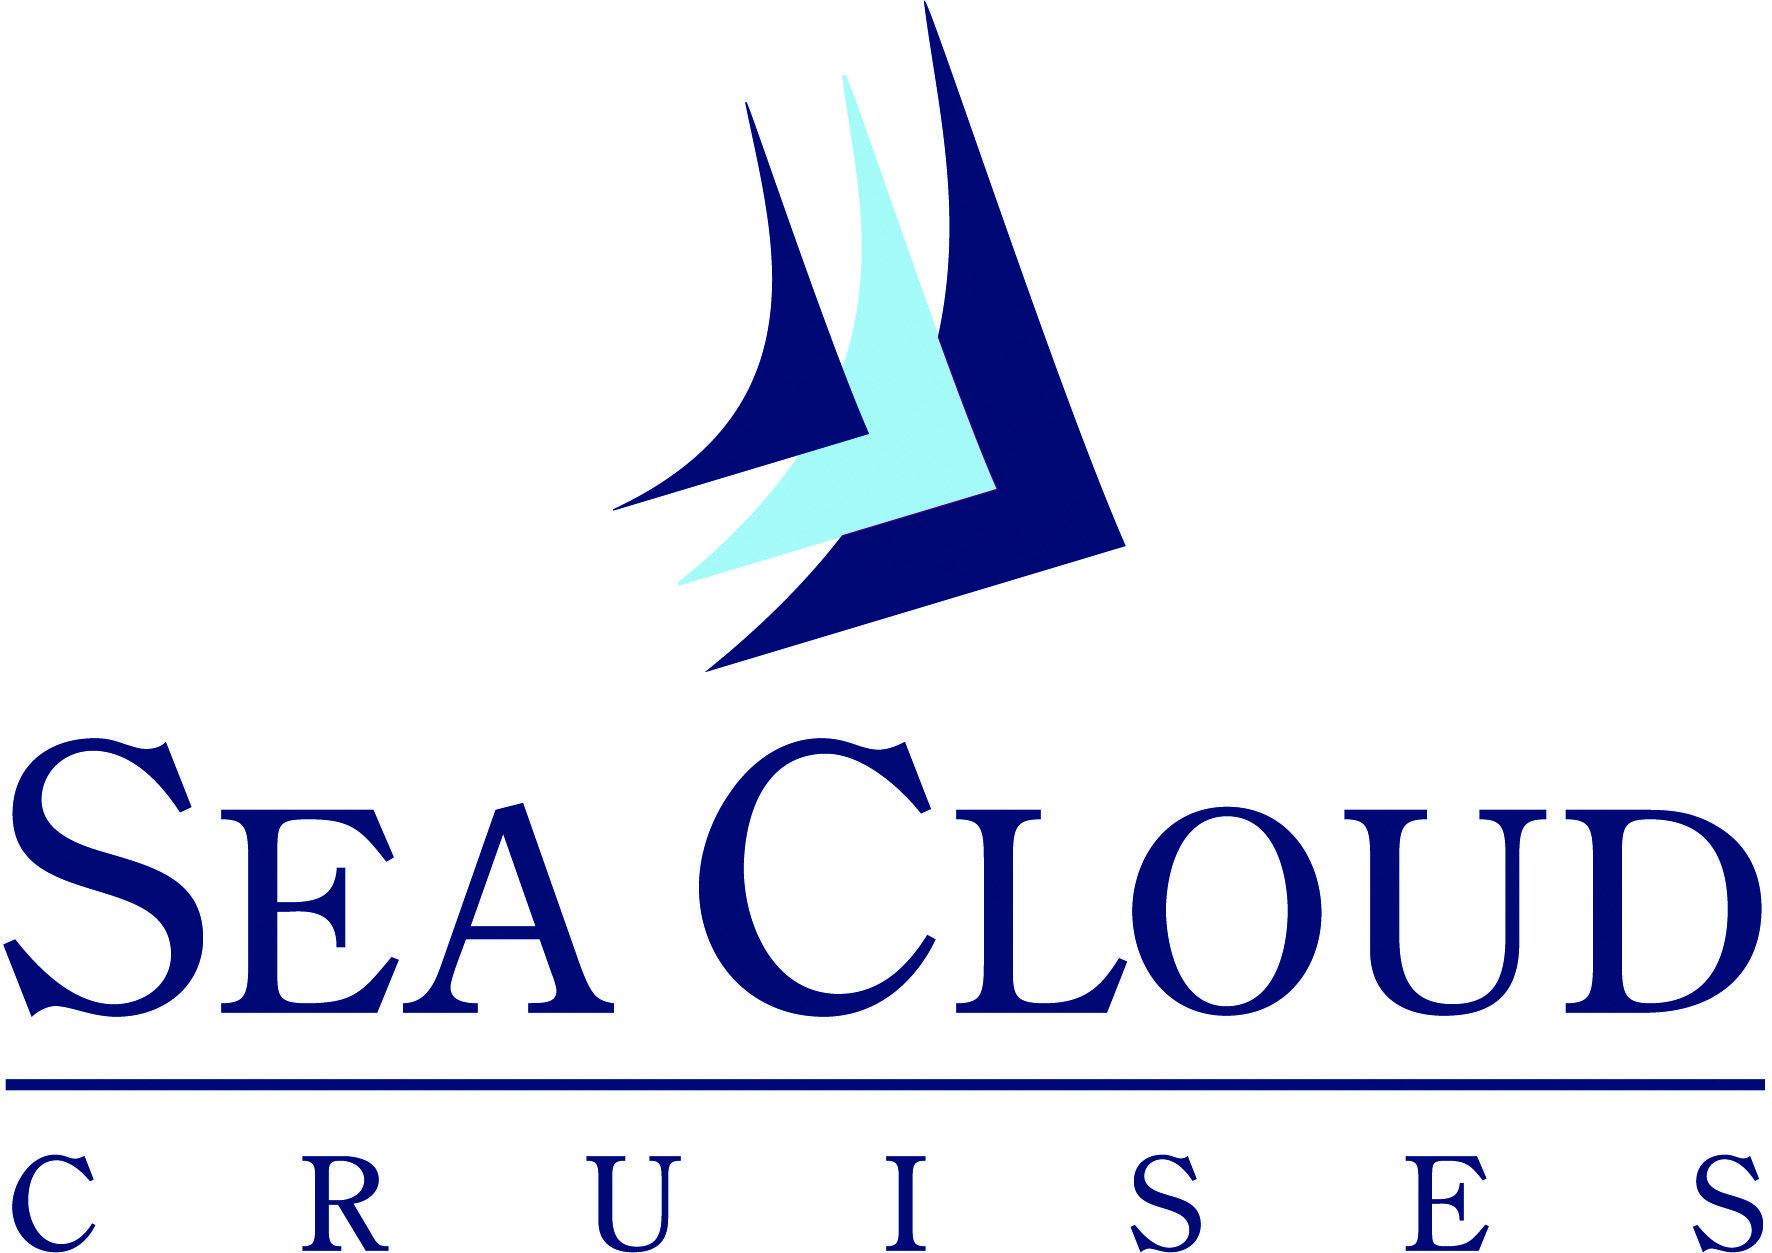 Seit April 2012 ist die Vickermann & Stoya Maßschuhmanufaktur offizieller Kooperationspartner von Sea Cloud